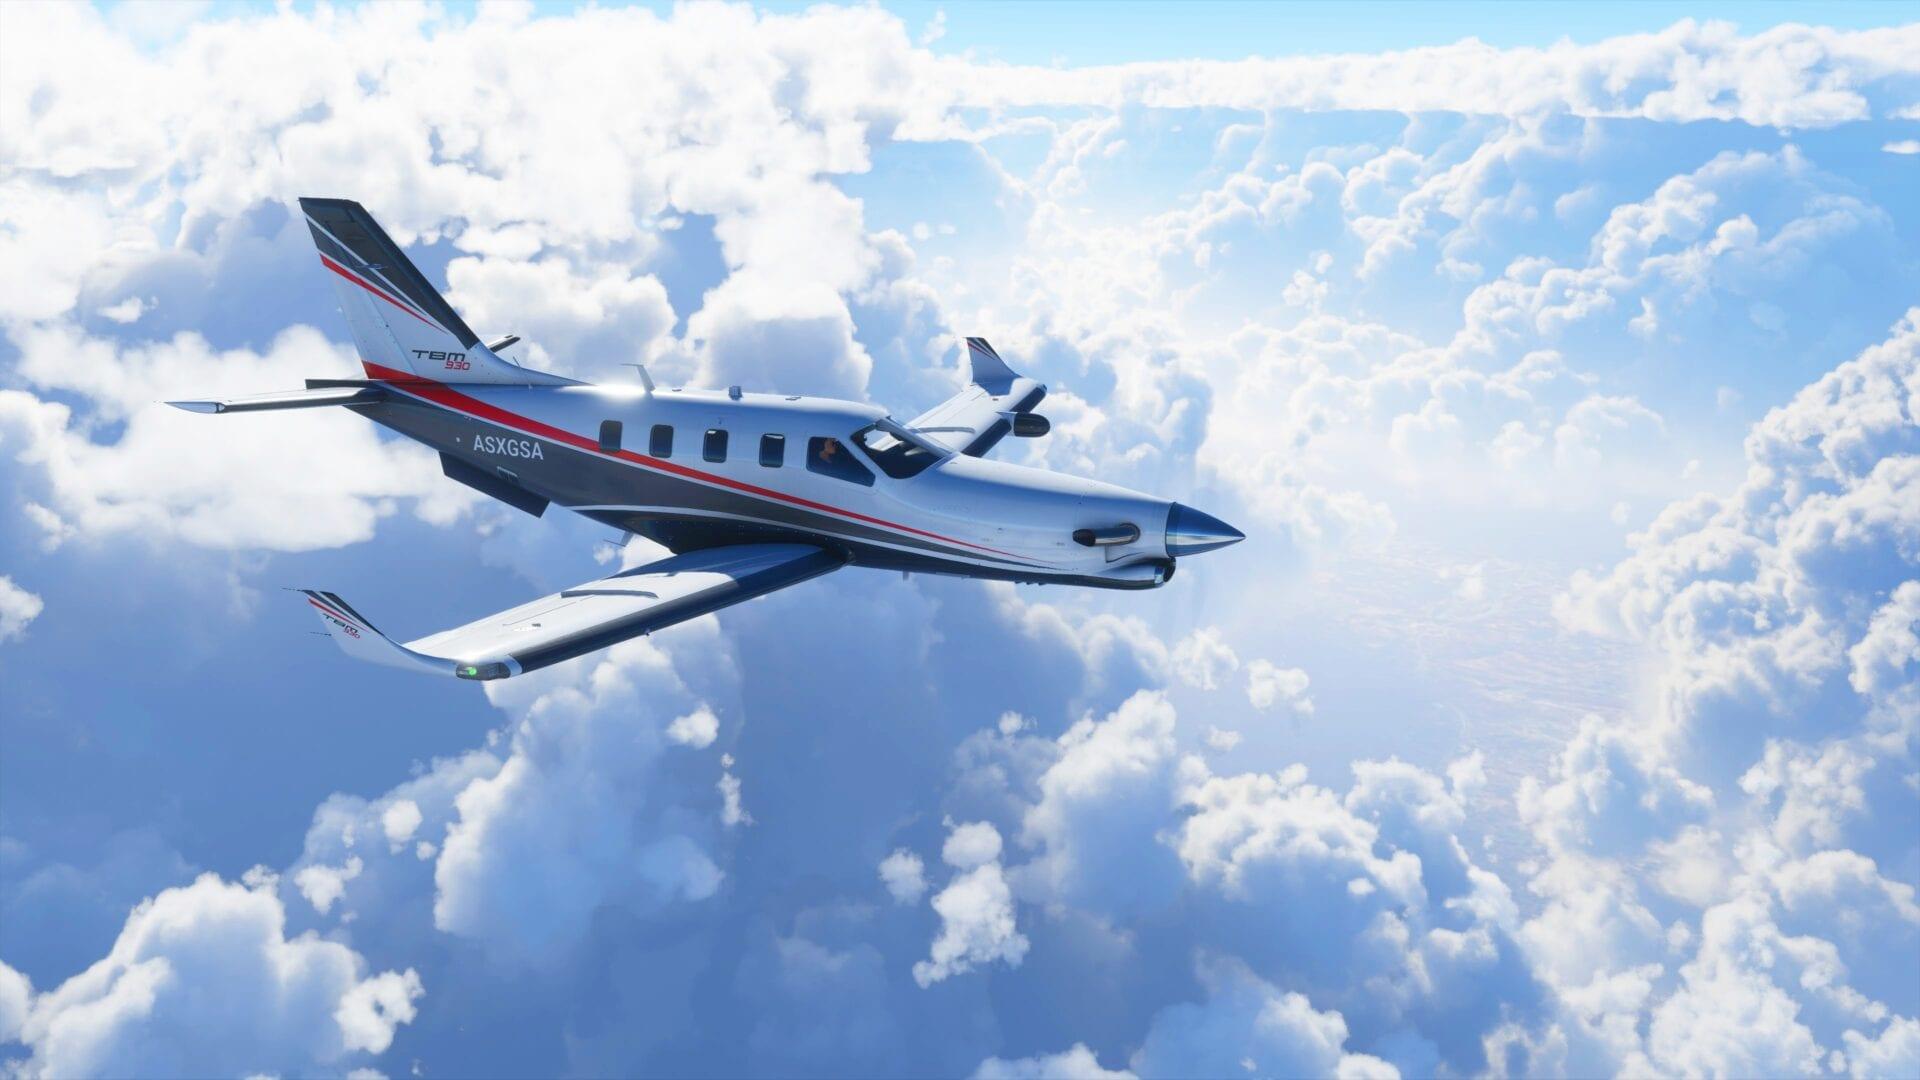 microsoft flight simulator change call sign tail number